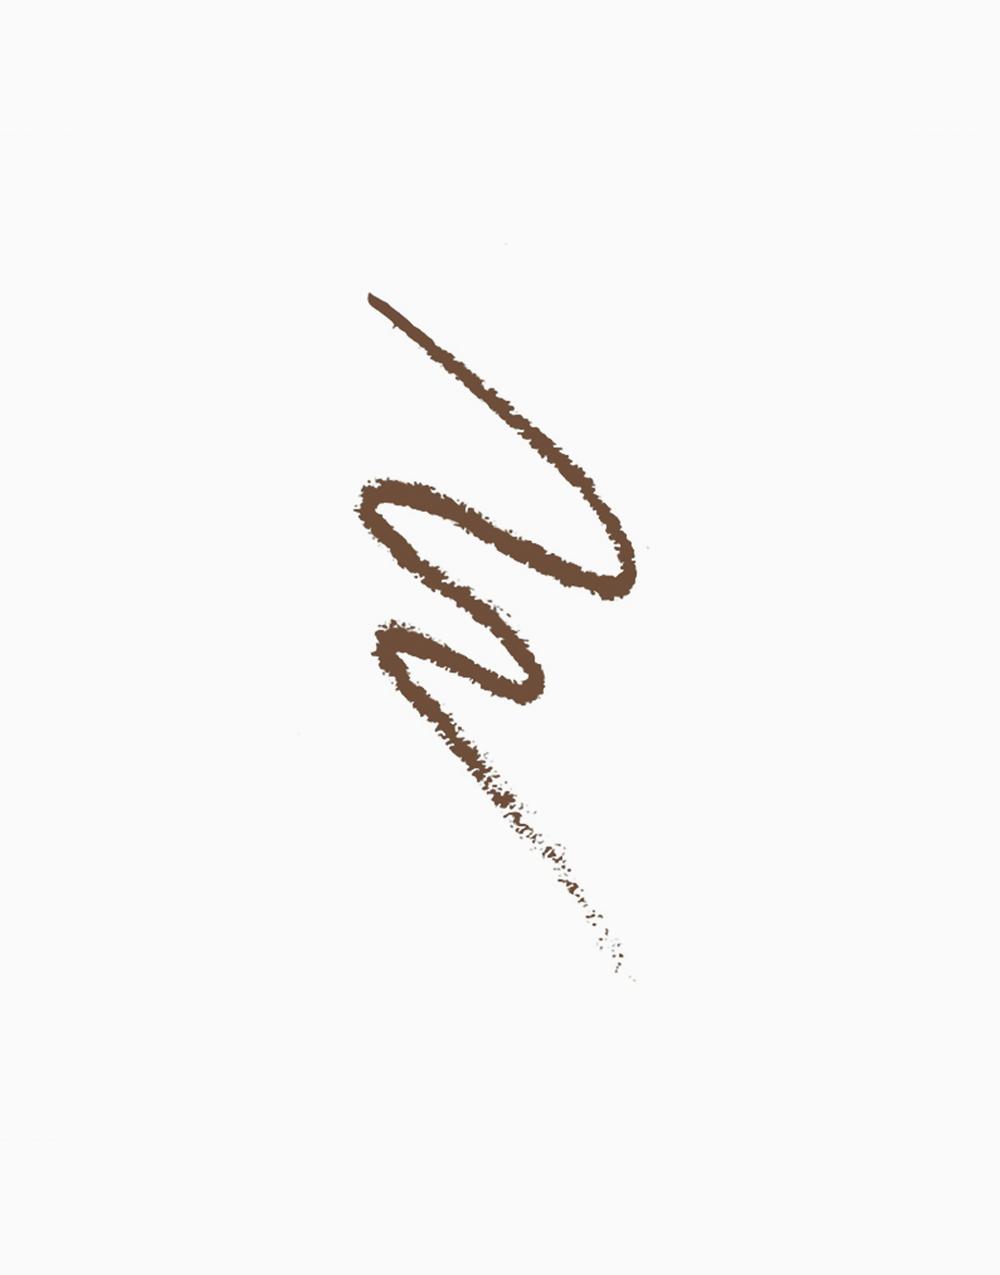 Powerproof Ink Brow  by Innisfree | #1. Espresso Brown